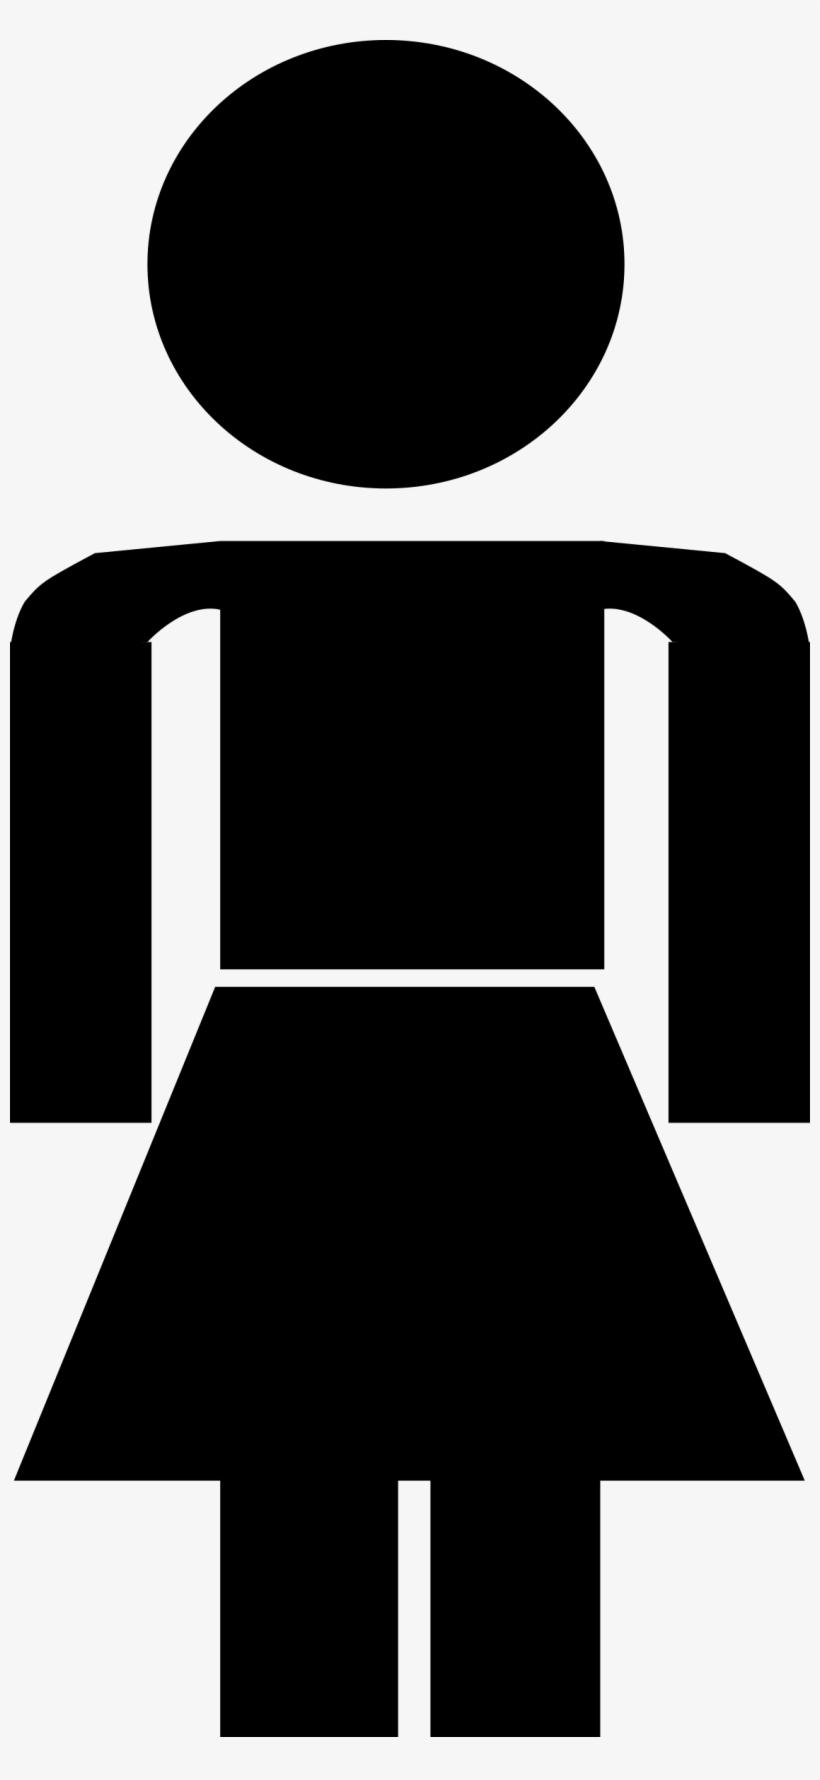 Female Stick Figure Png - Human Stick Figure Female, transparent png #751248